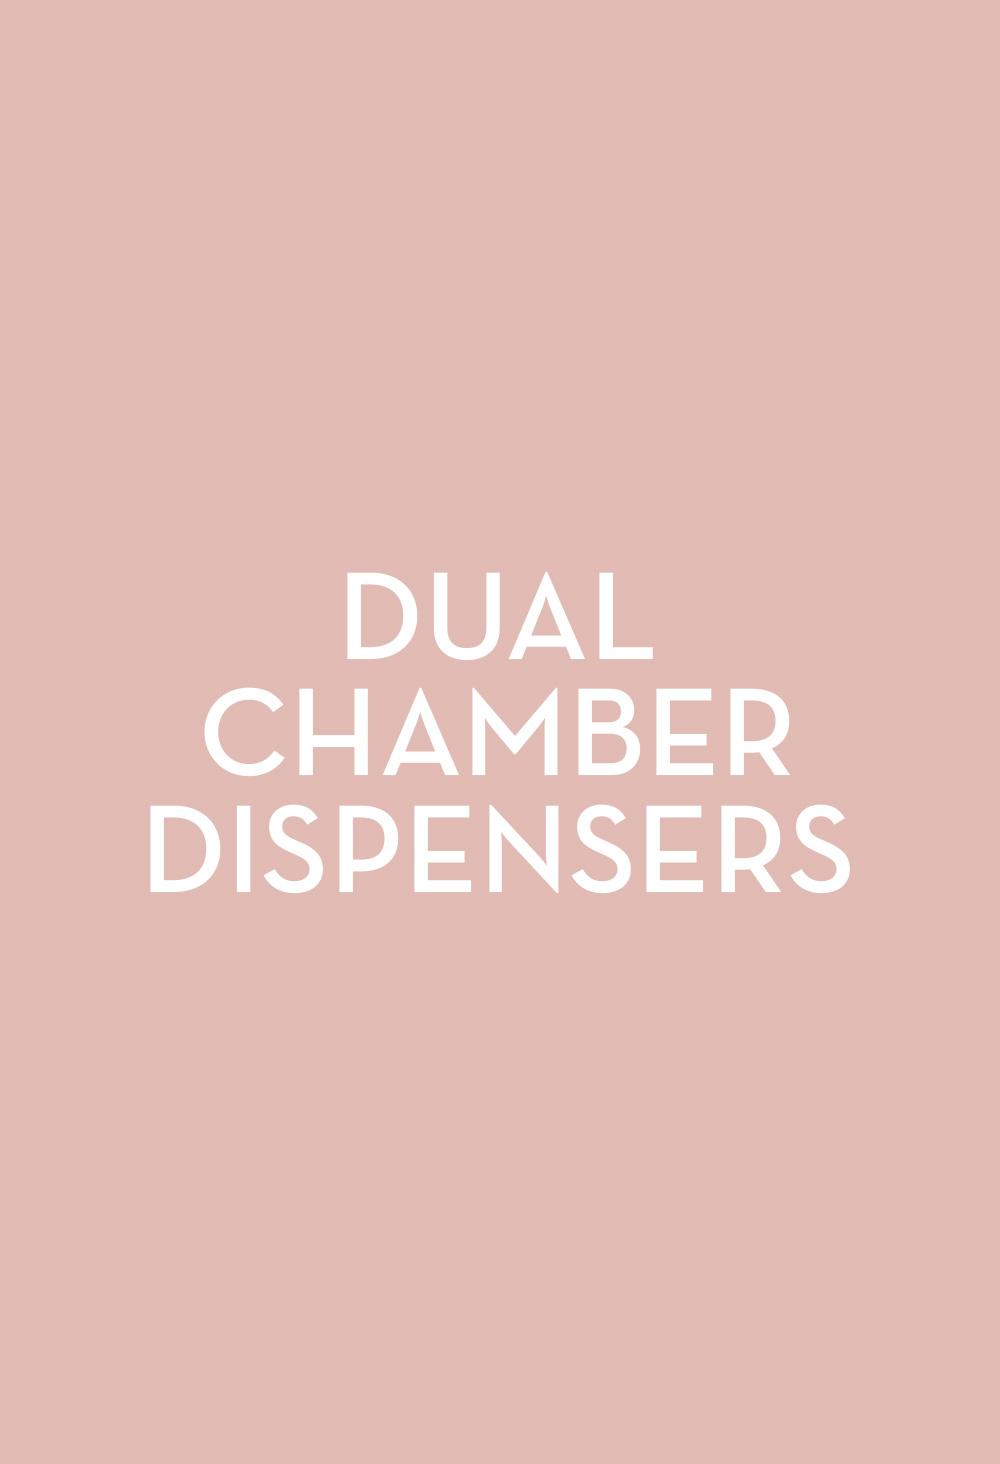 Dual Chamber Dispensers - Fasten